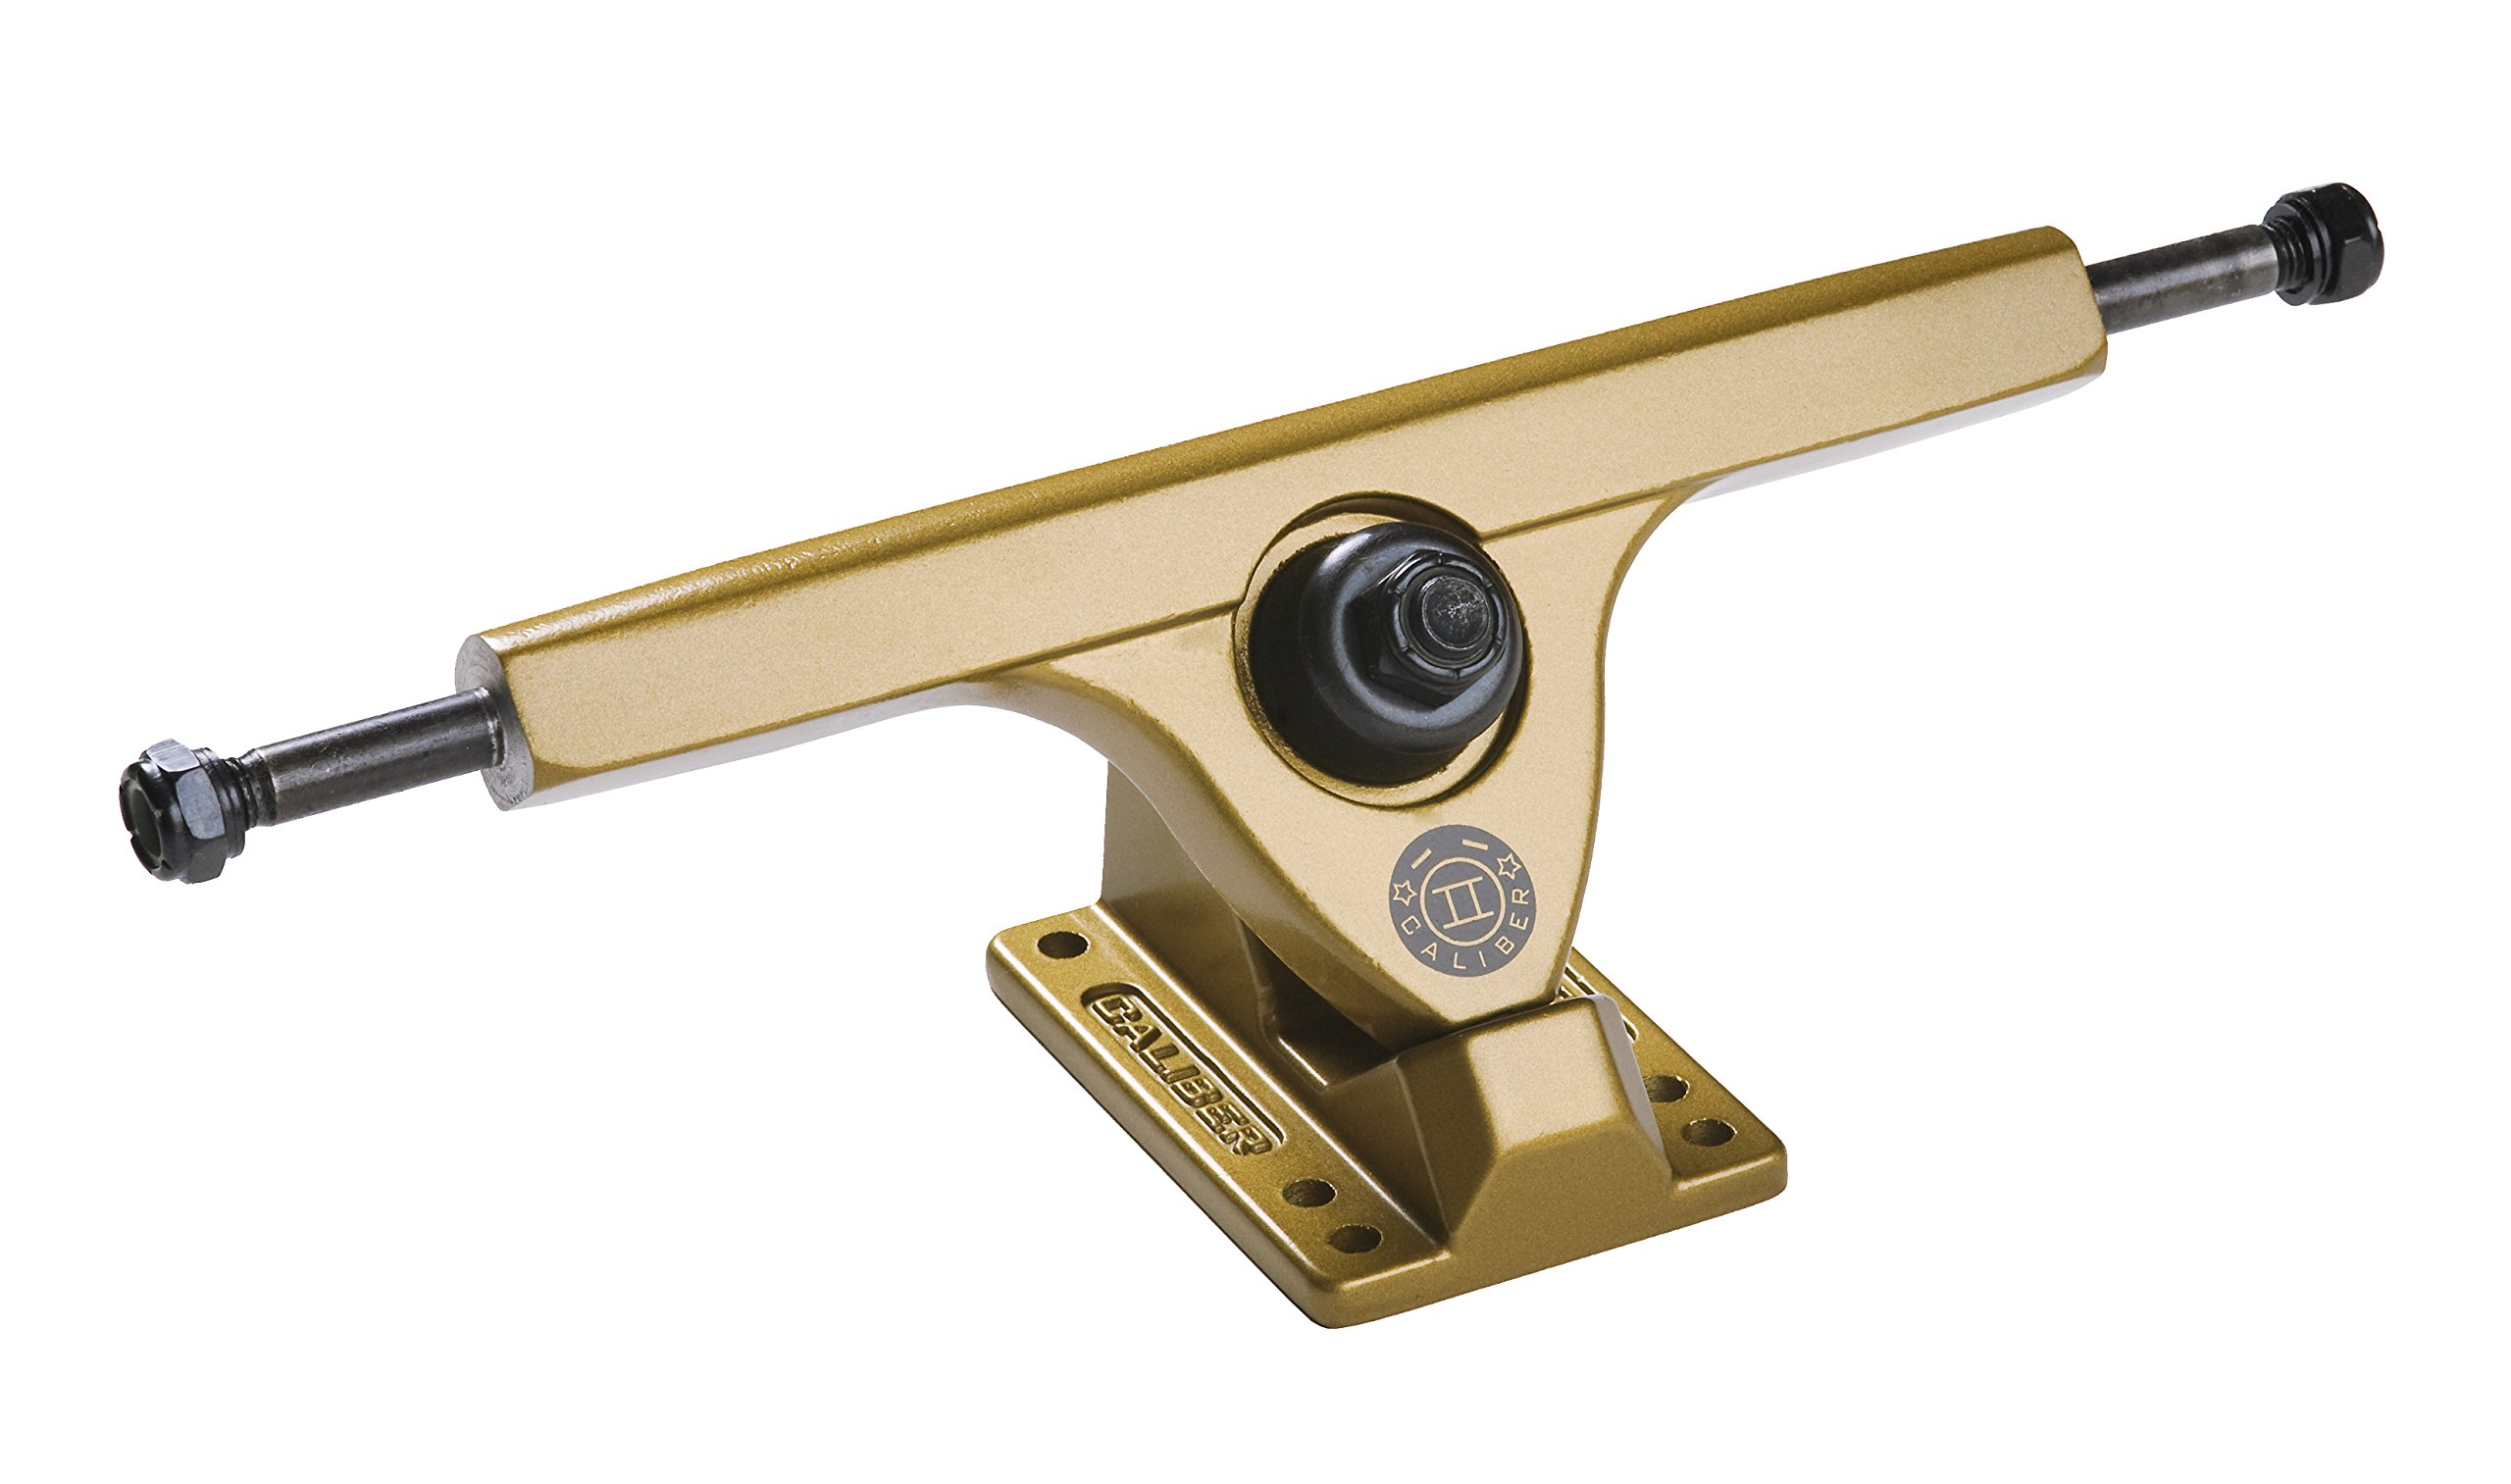 Caliber Trucks Cal II 50° RKP Longboard Trucks (Satin Gold) by Caliber Truck Co.